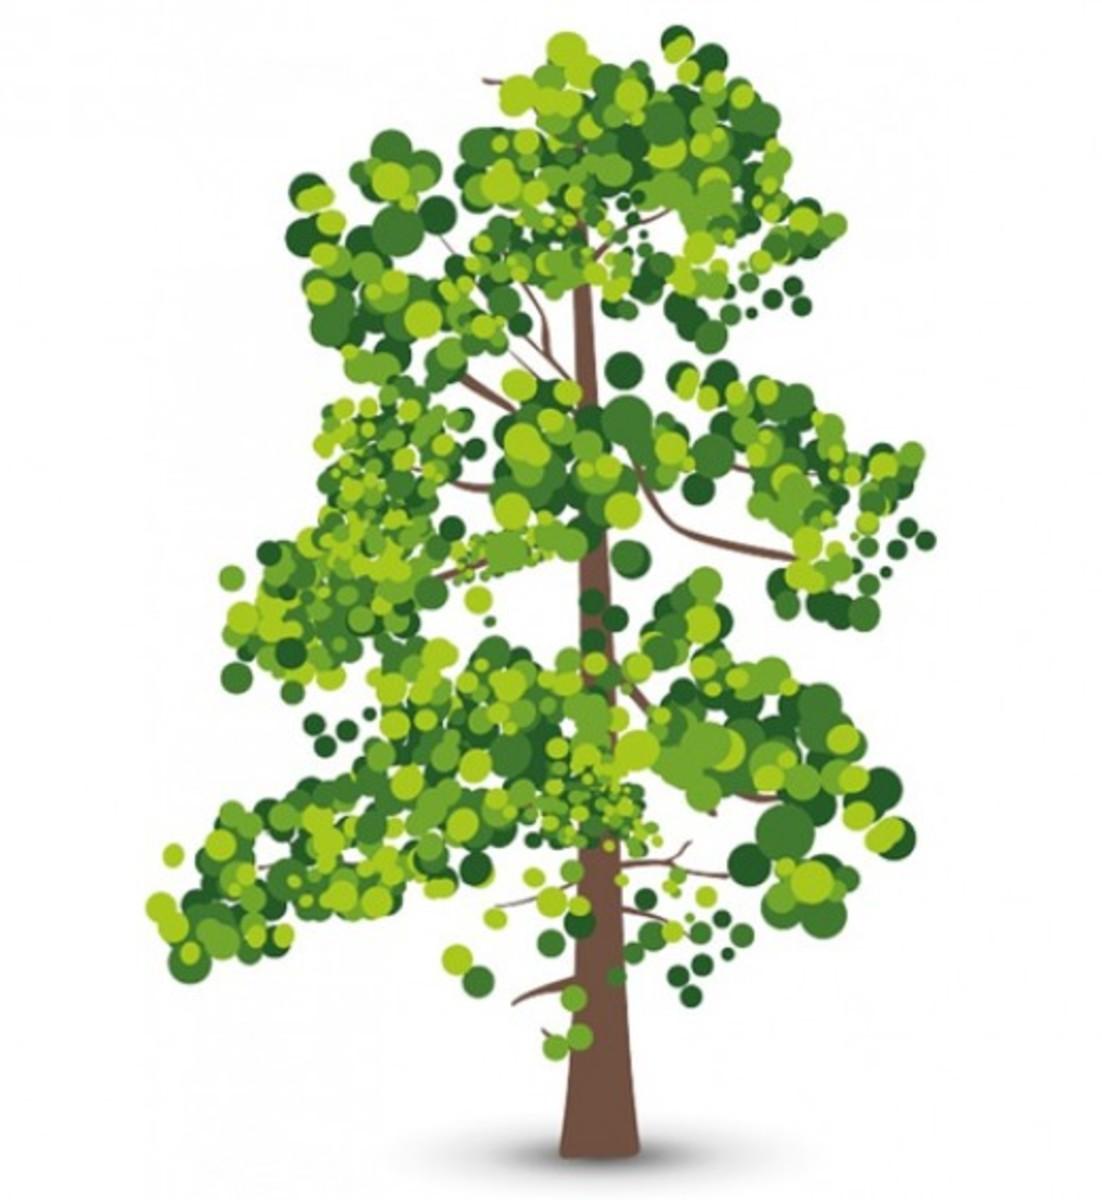 Leafy Green Tree Clip Art